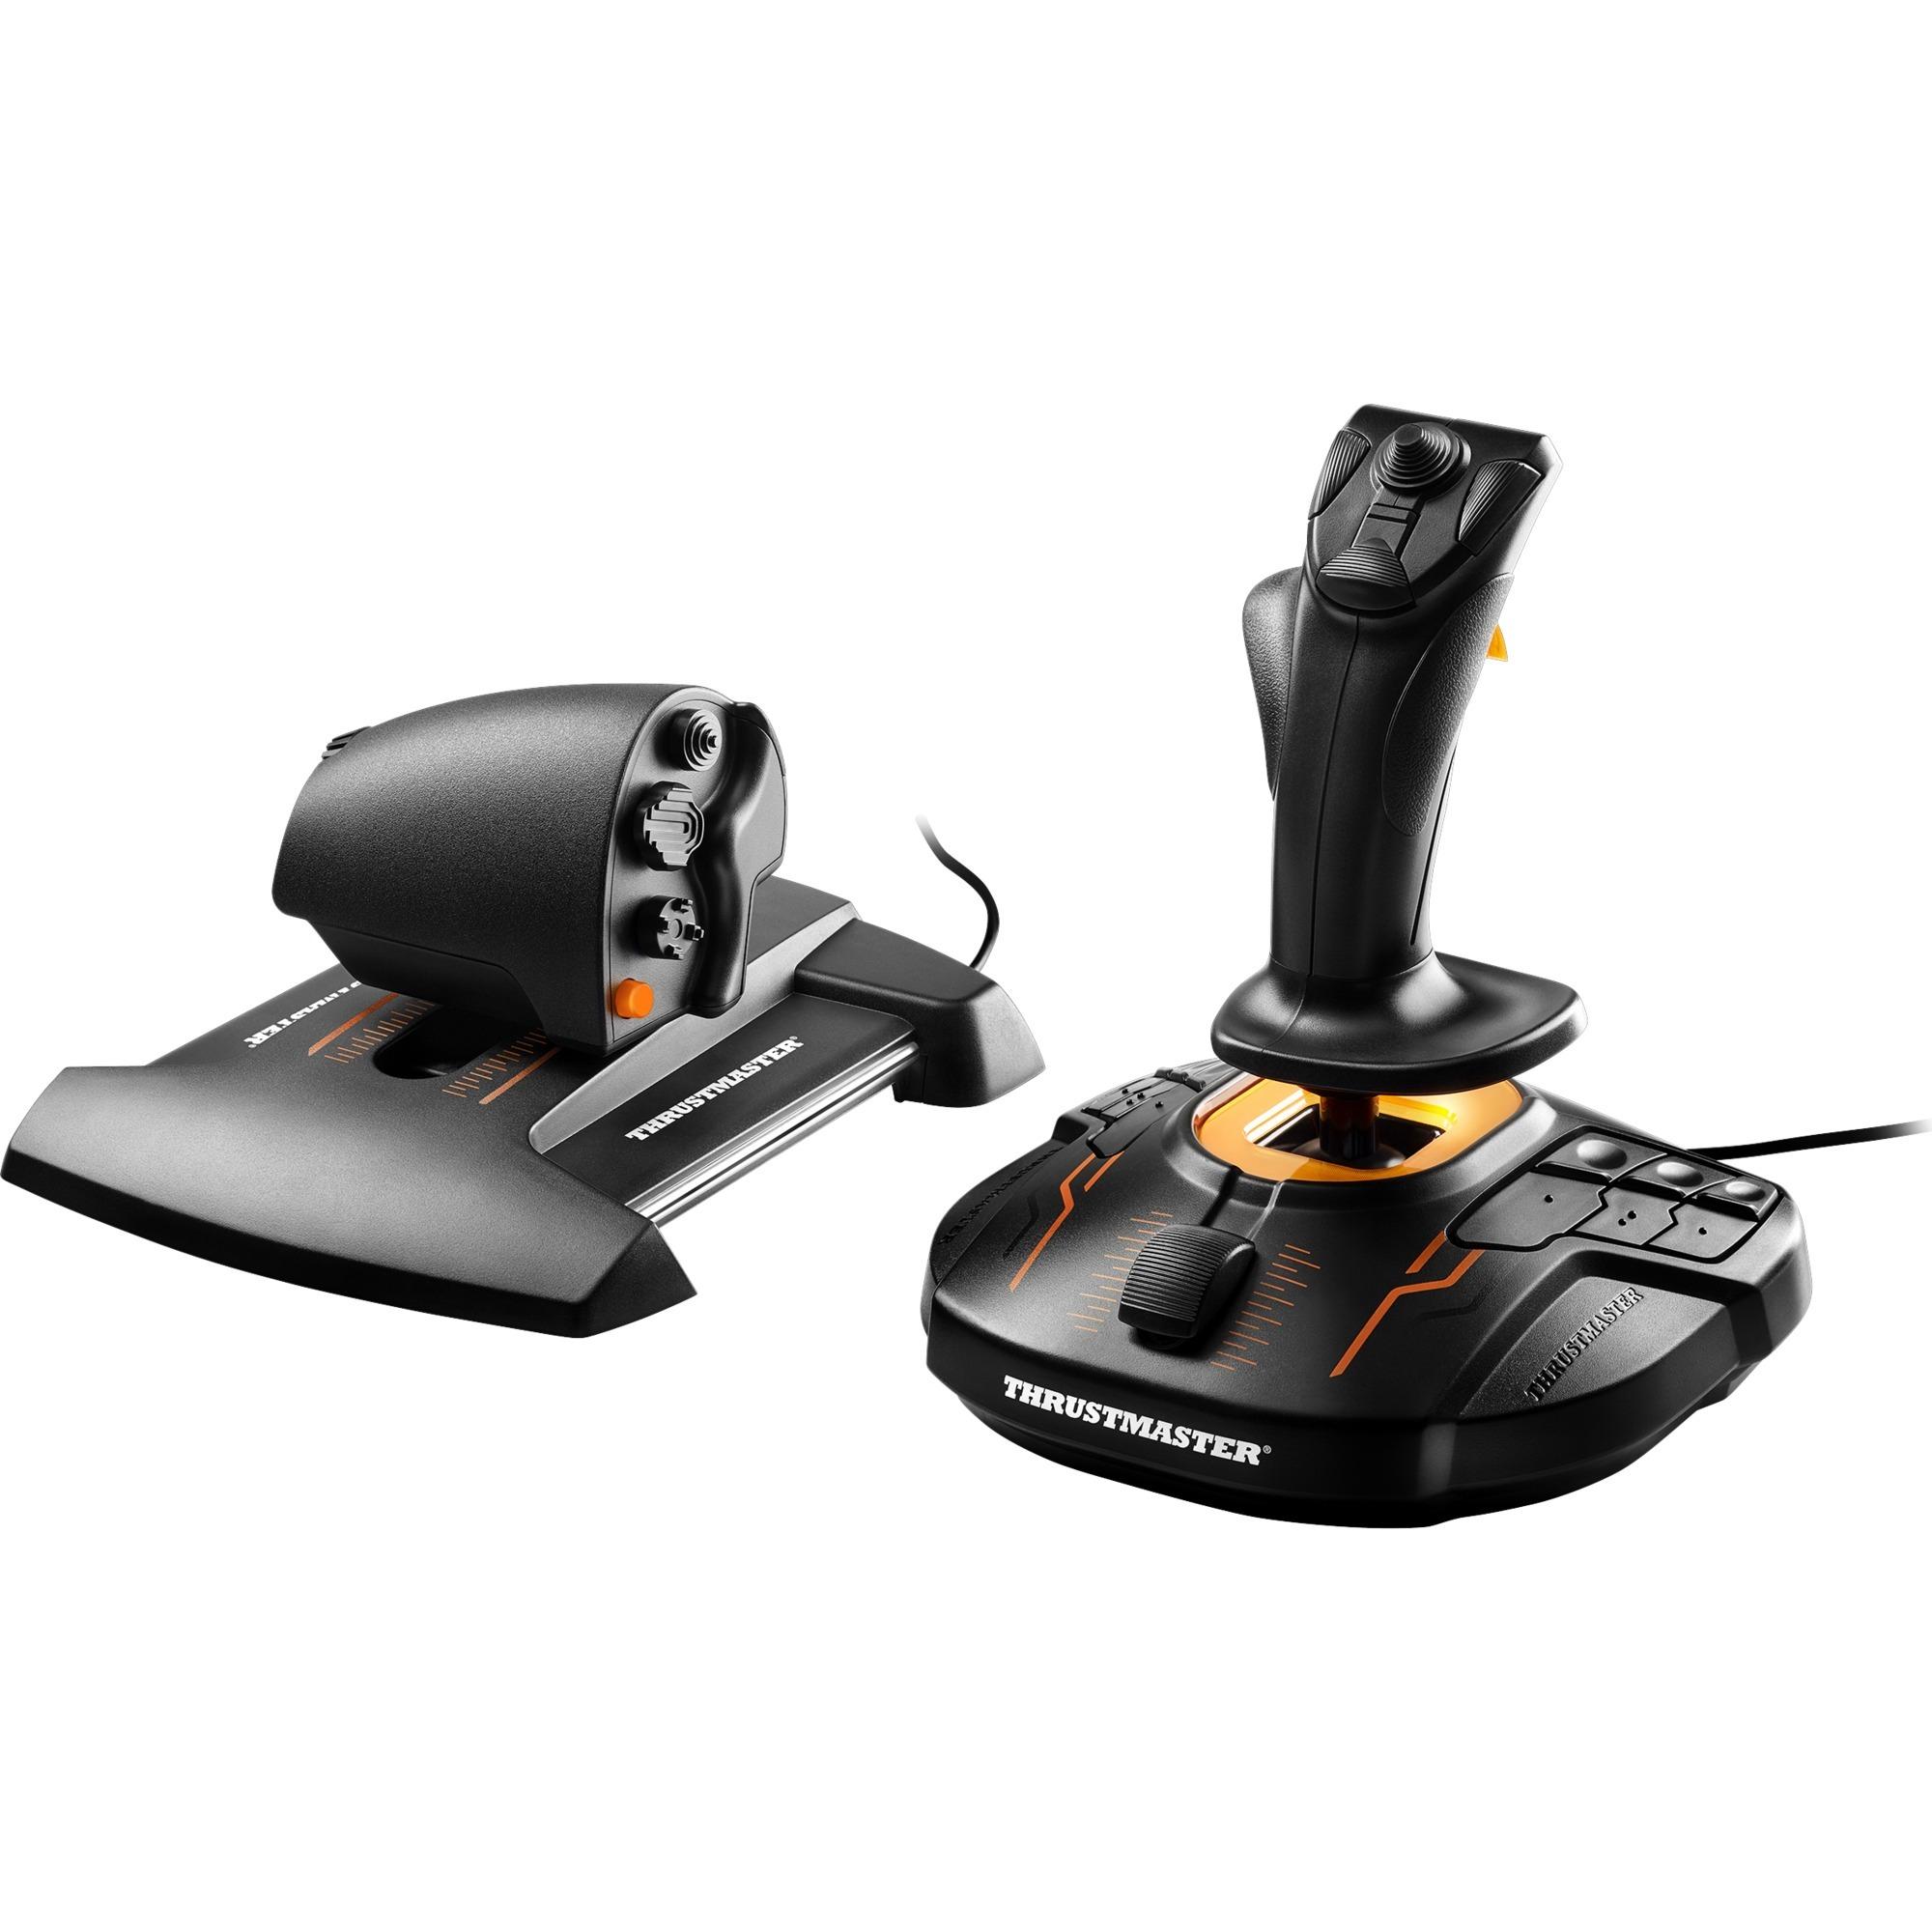 T.16000M FCS Hotas Palanca de mando Mac, PC Negro, Naranja, Hotas (mando más palanca de control)